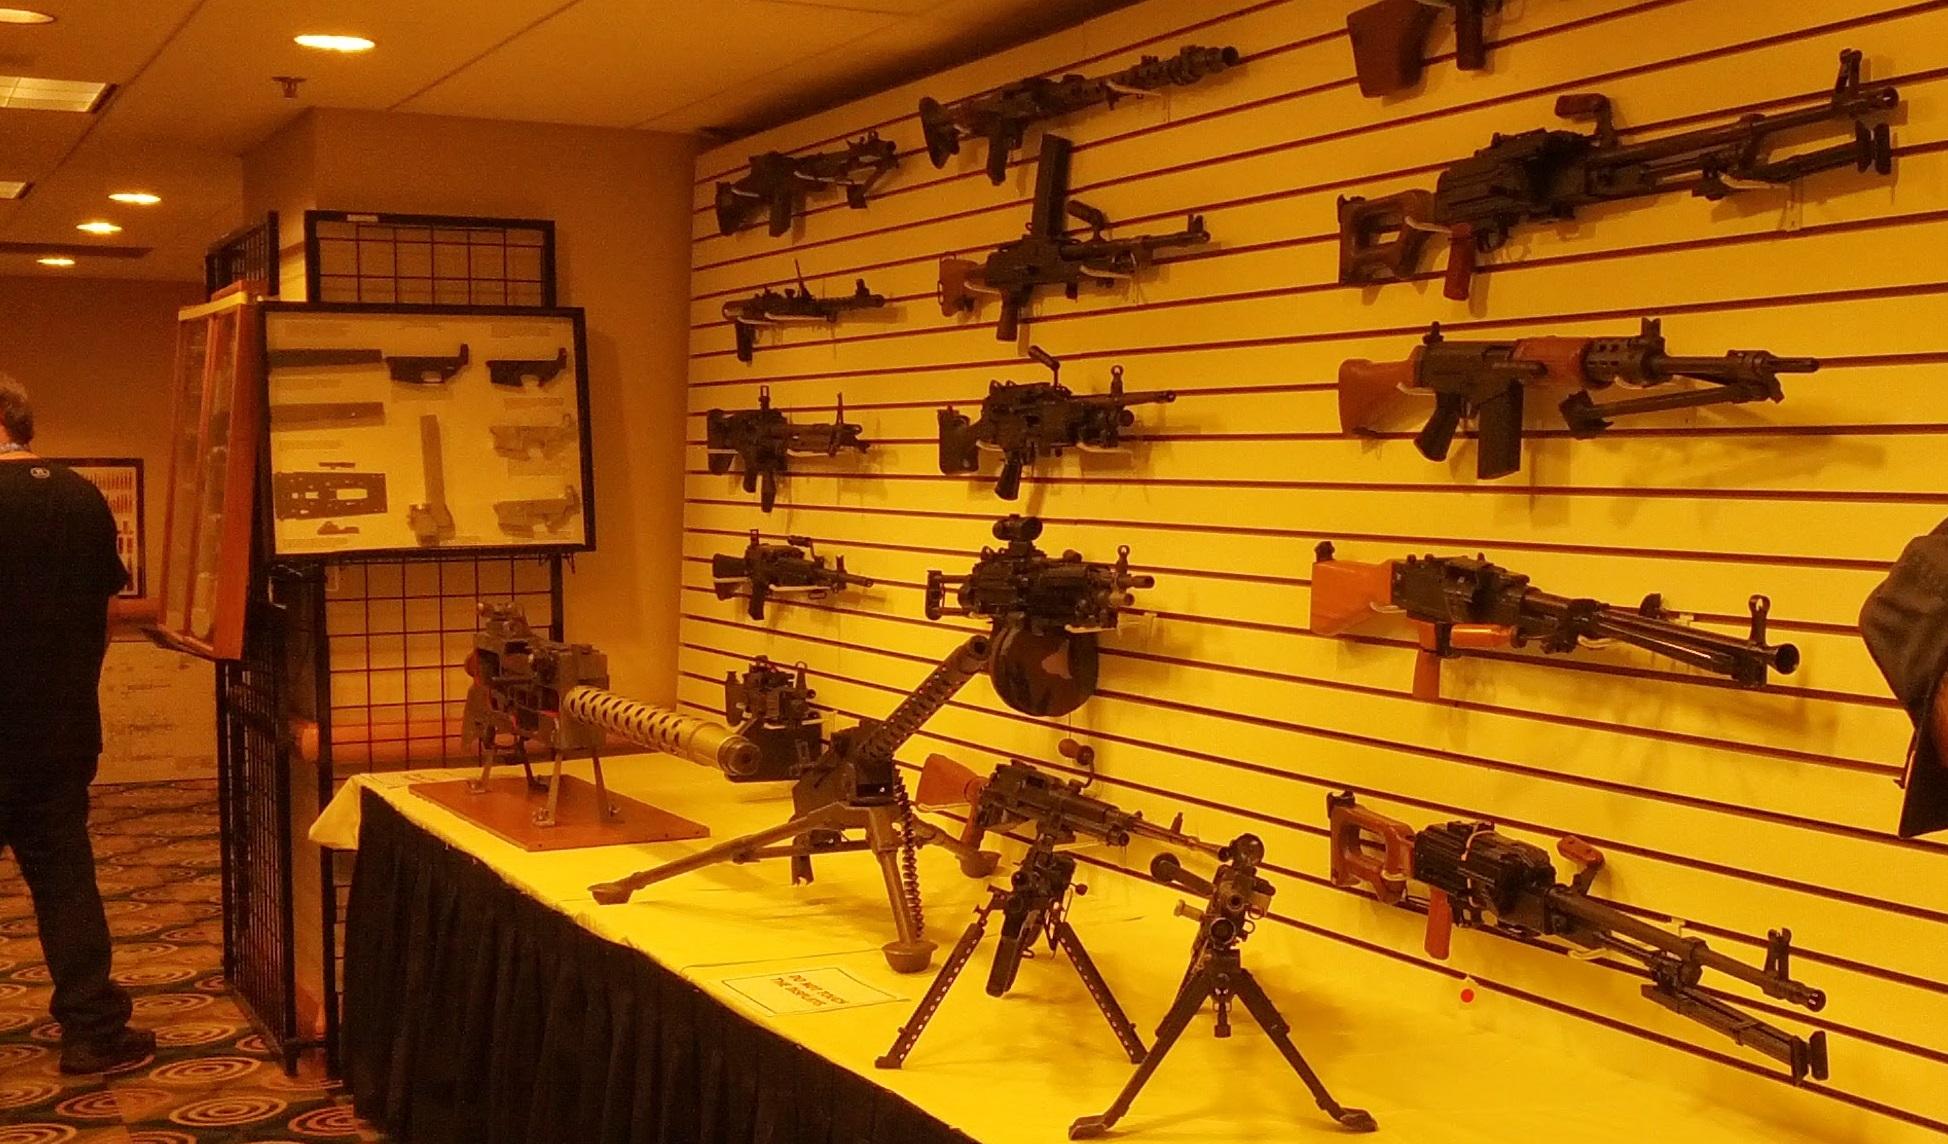 display of armament